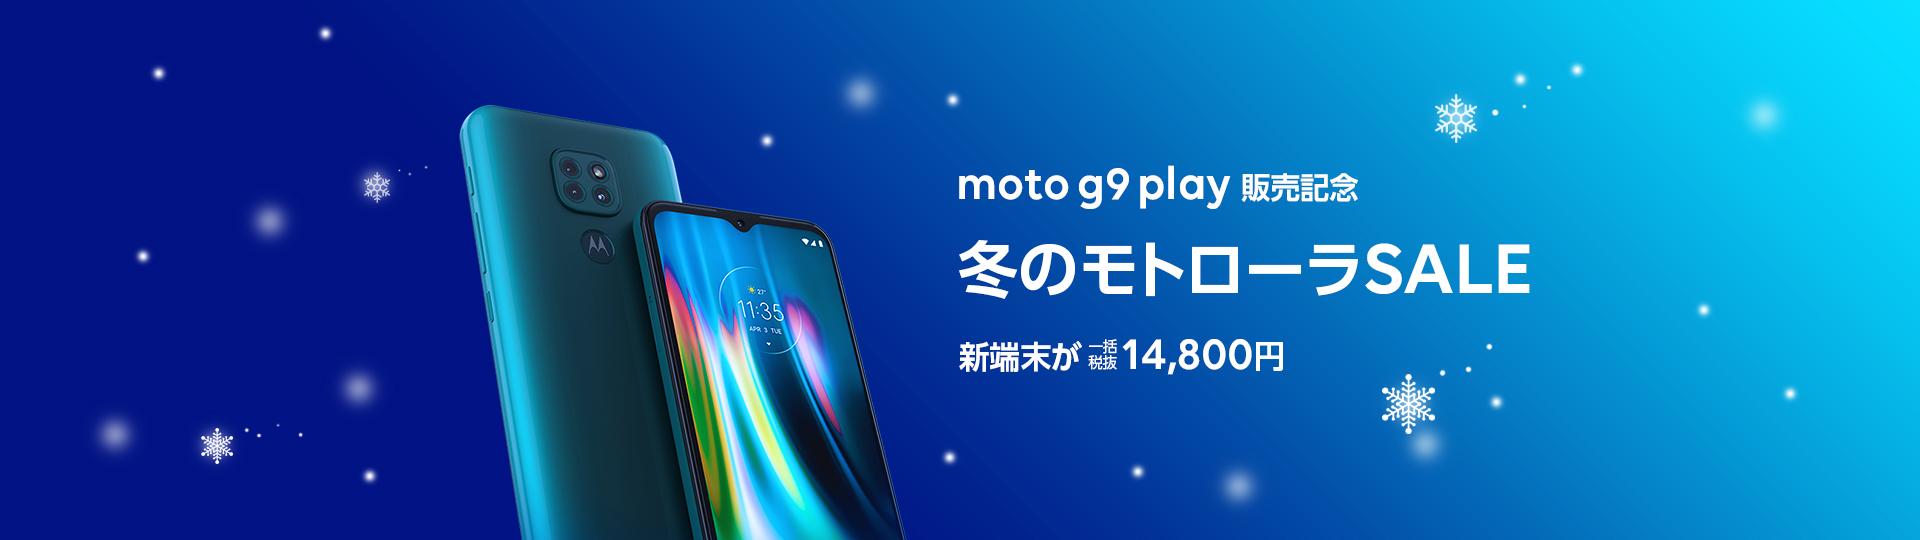 moto g9 play販売記念  冬のモトローラSALE  新端末が14,800円(一括・税抜)